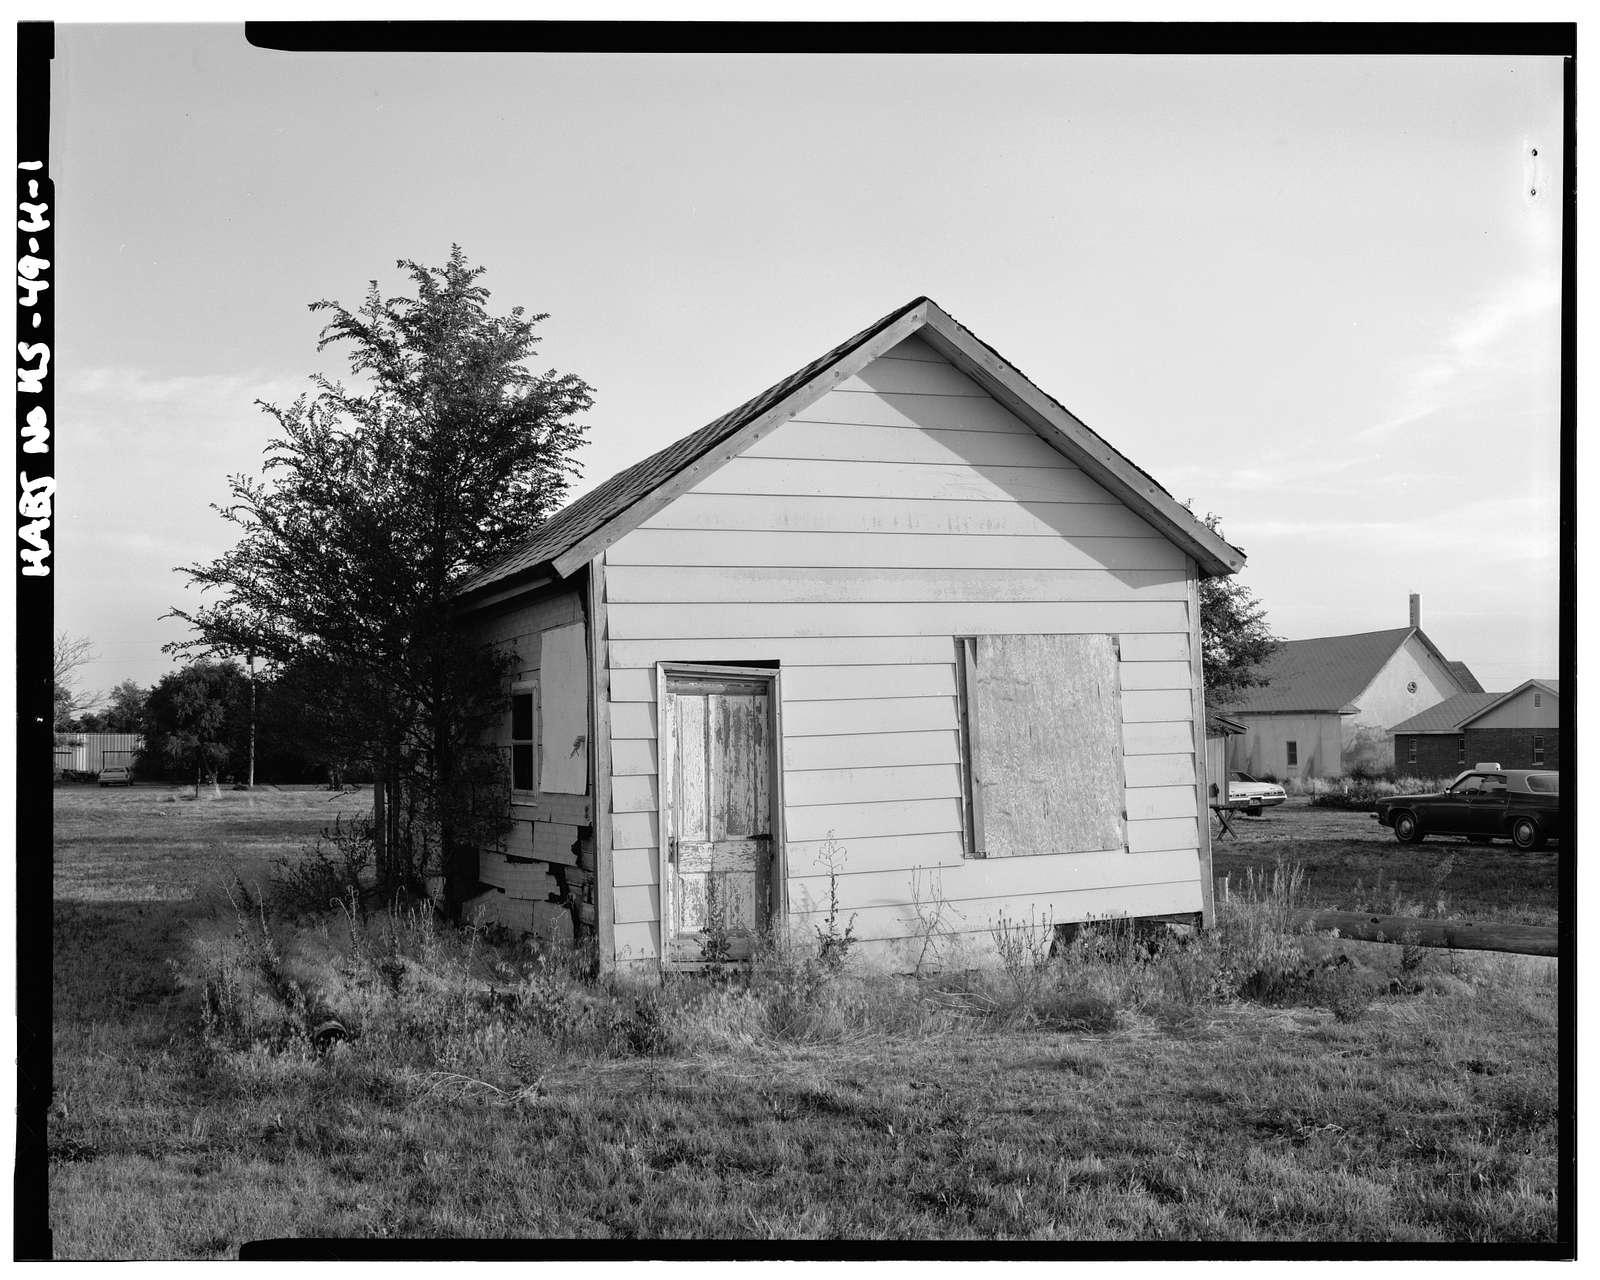 Joe Wilson's Post Office, South Avenue & Third Street (moved to), Nicodemus, Graham County, KS